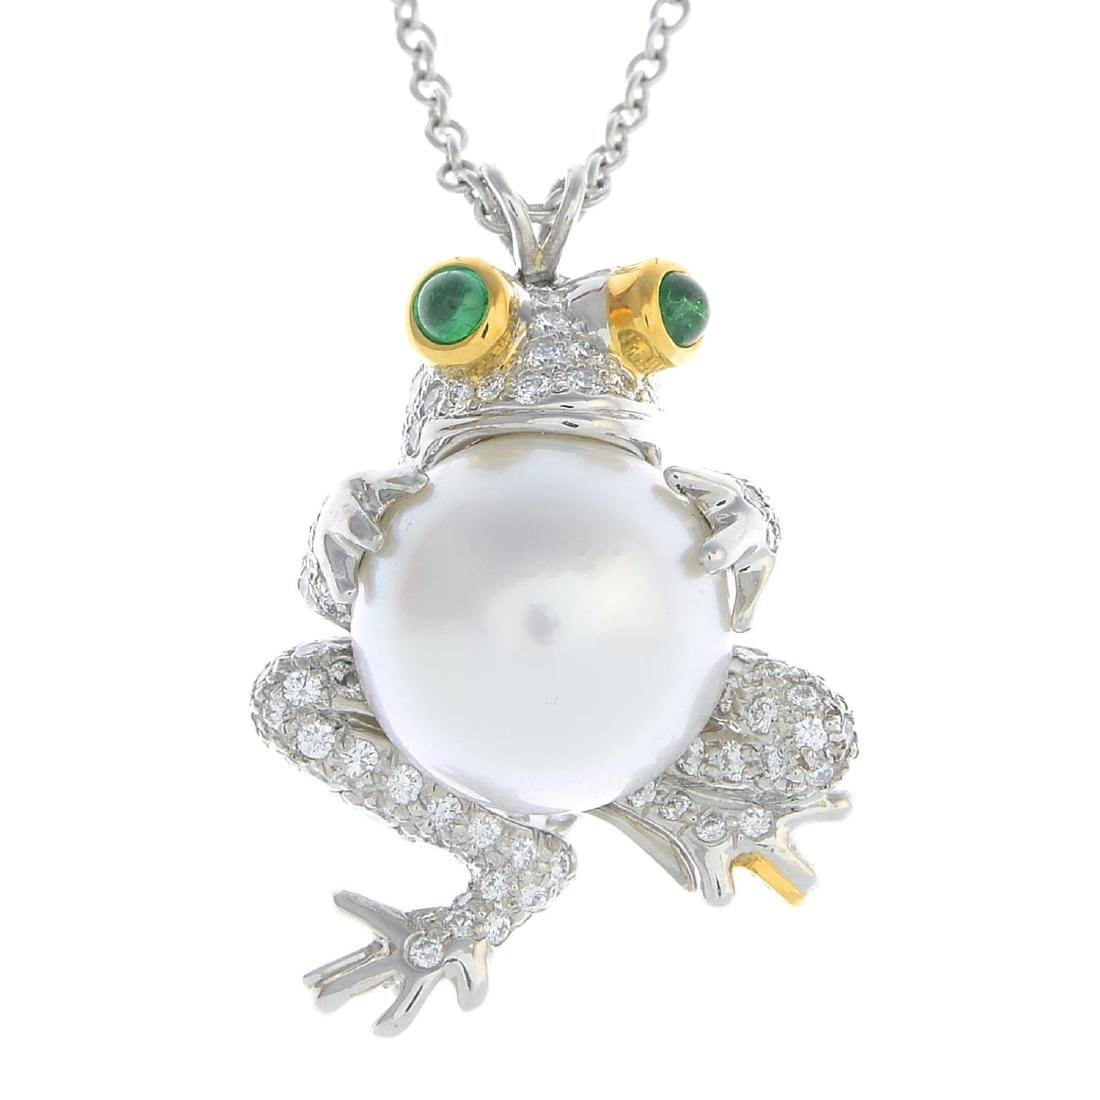 TIFFANY & CO. - a diamond and gem-set pendant. Designed